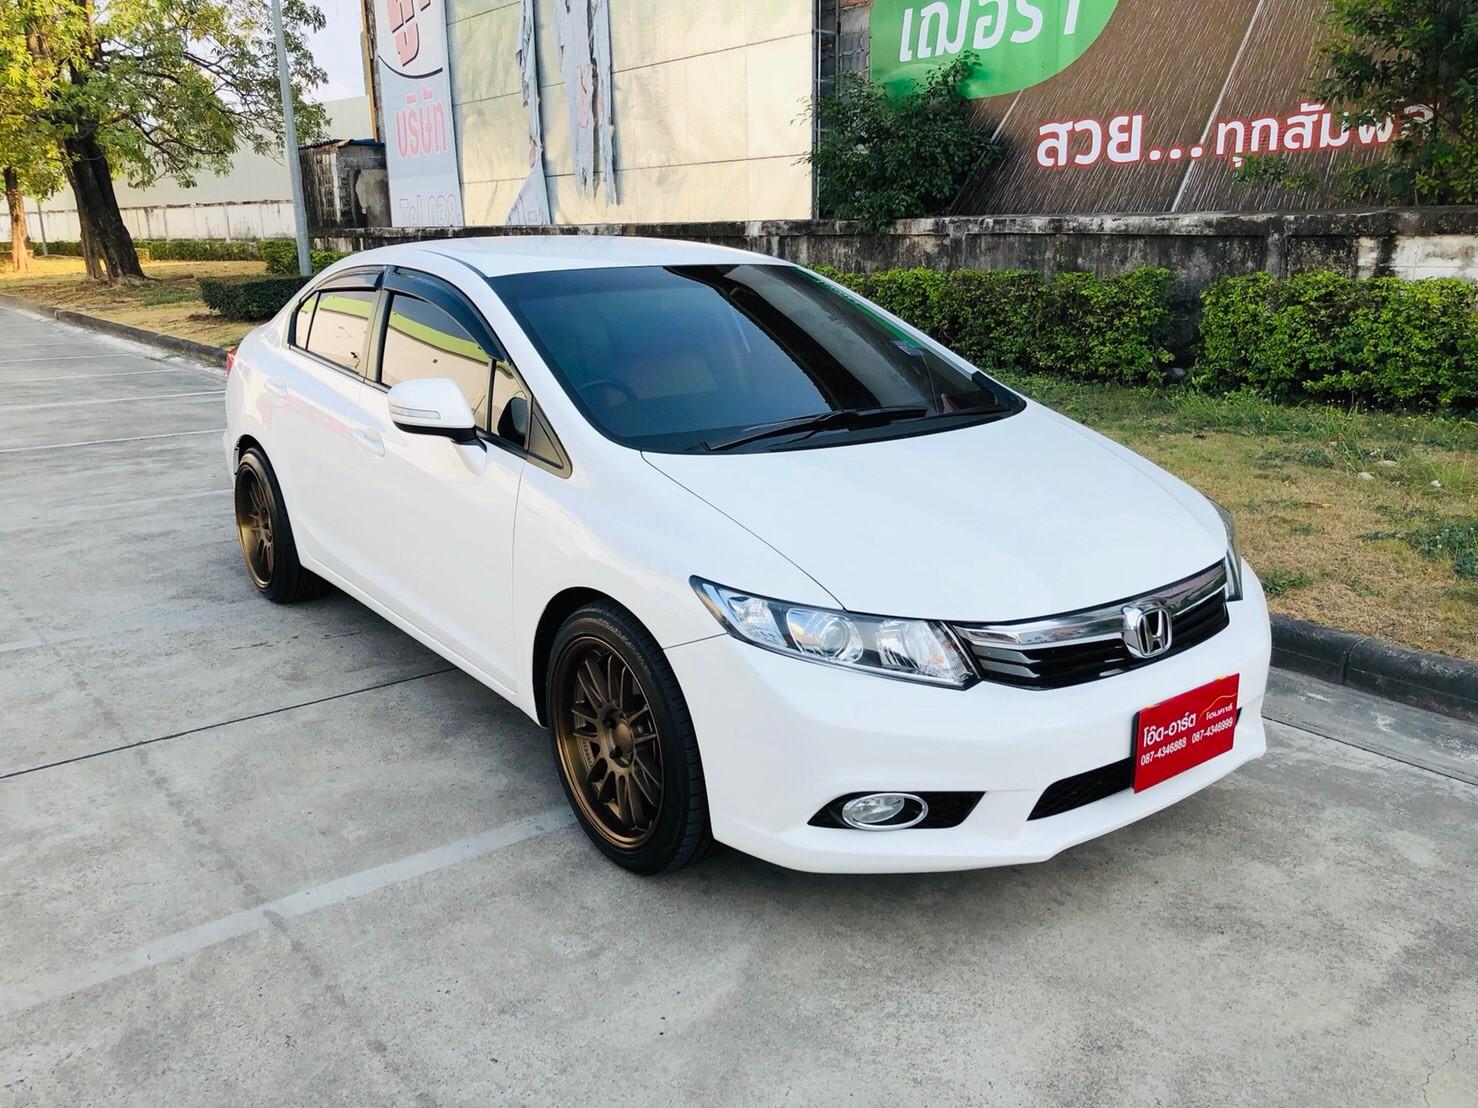 2012 Honda Civic 1.8 E